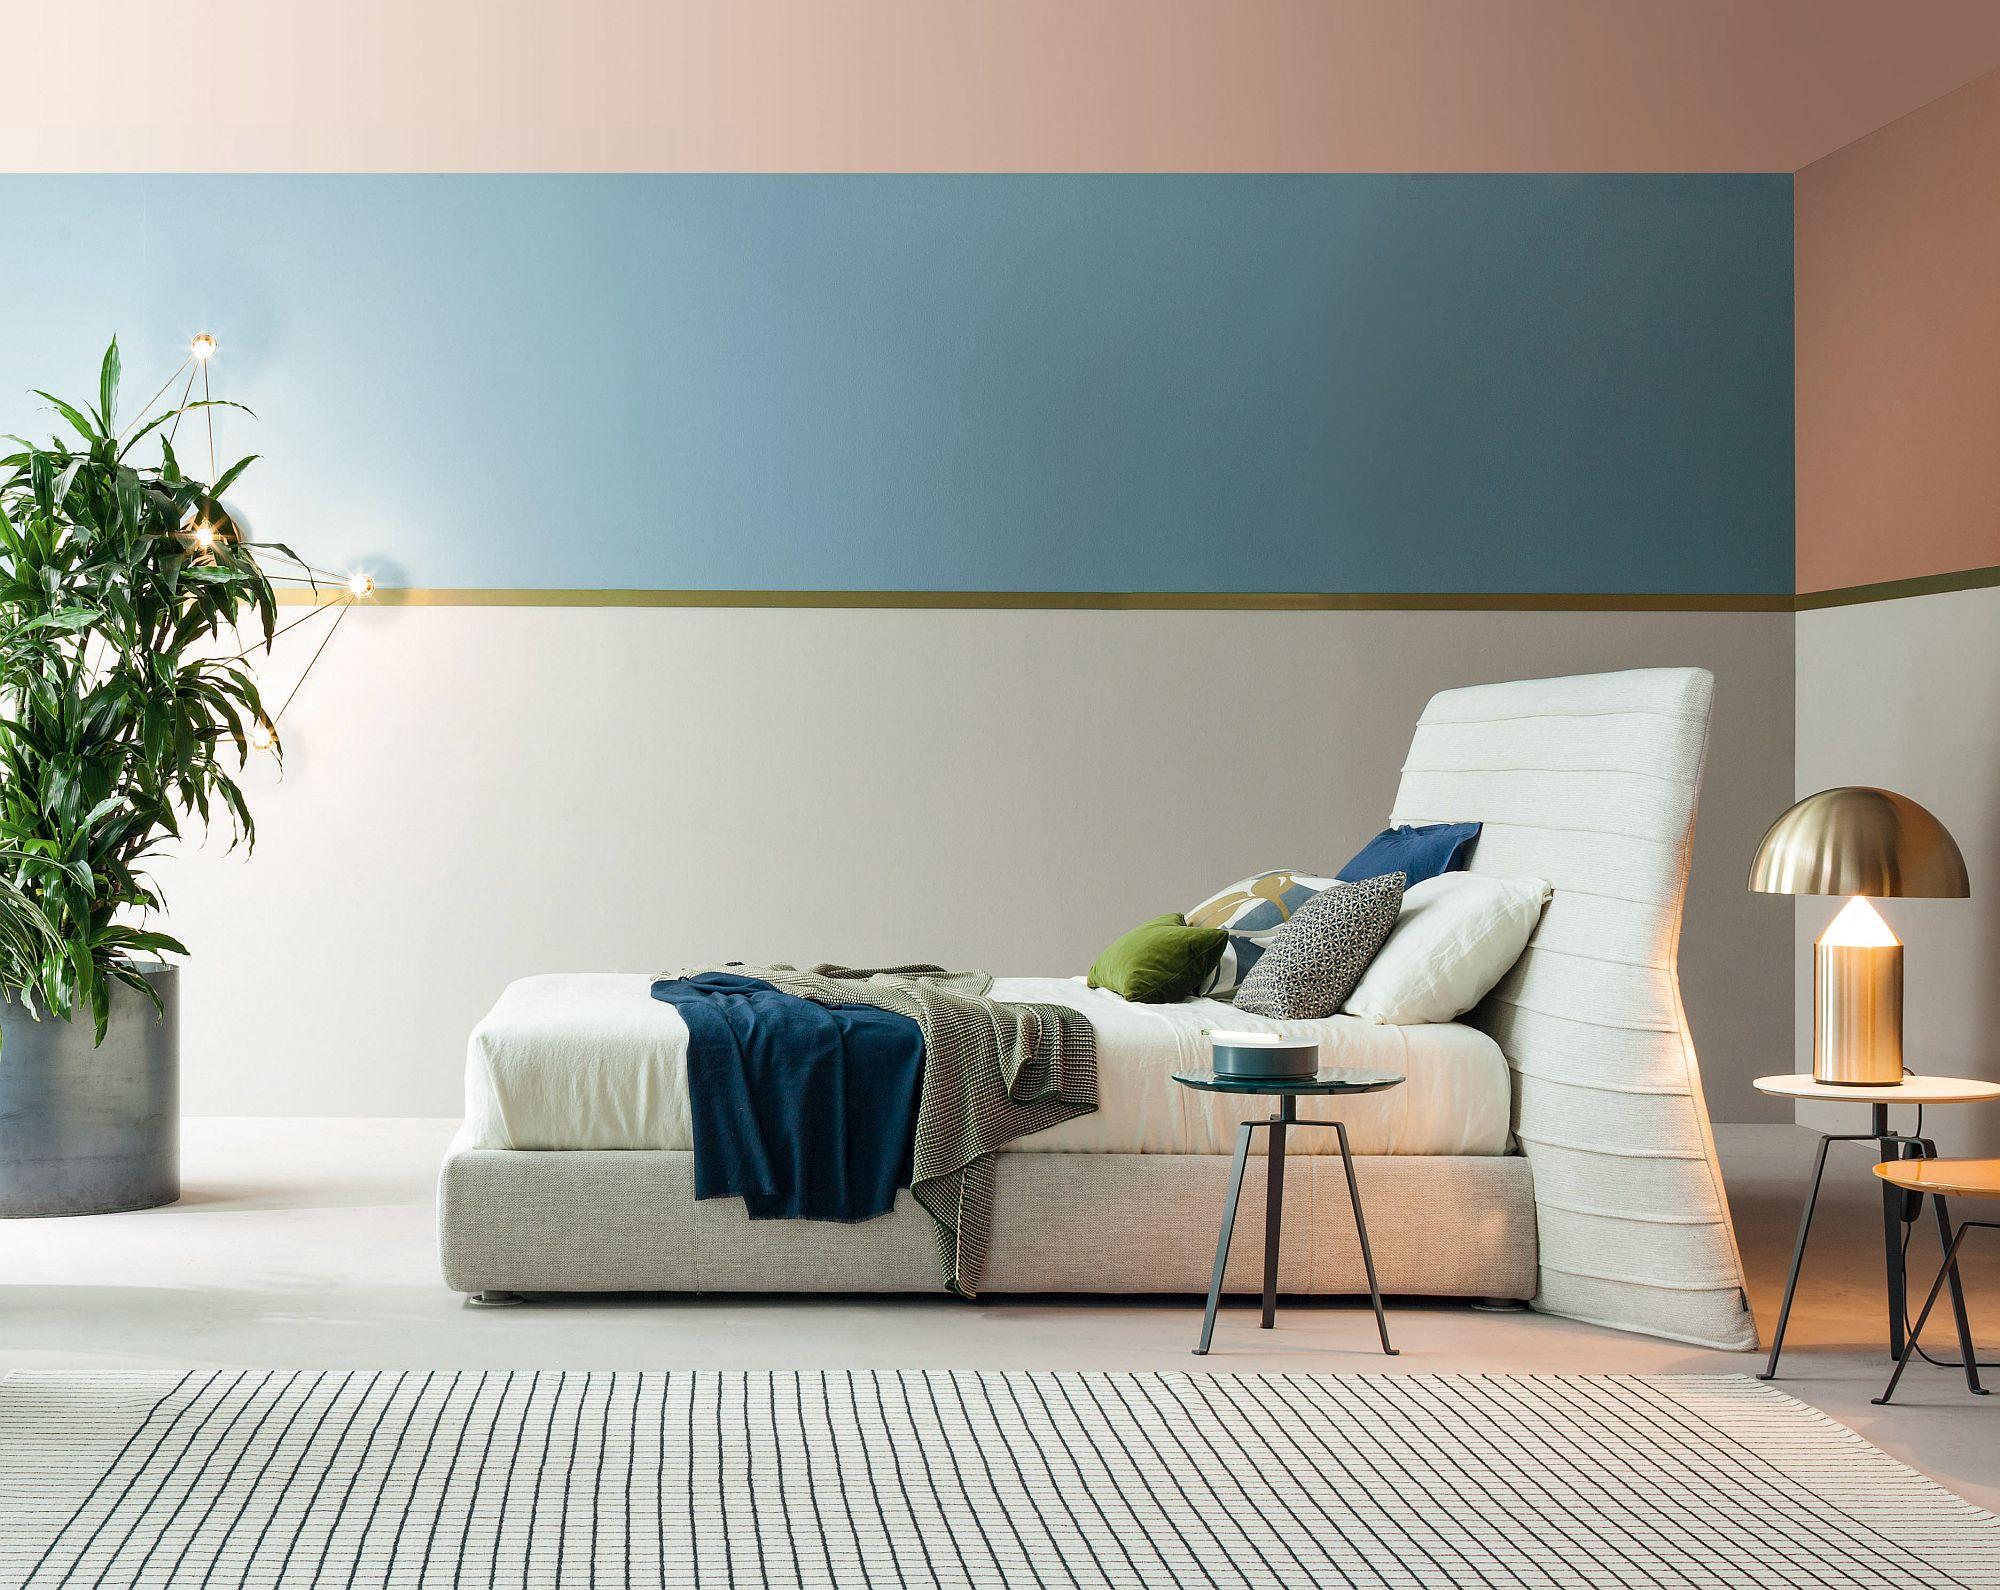 Slim and elegant bed designed by Mauro Lipparini